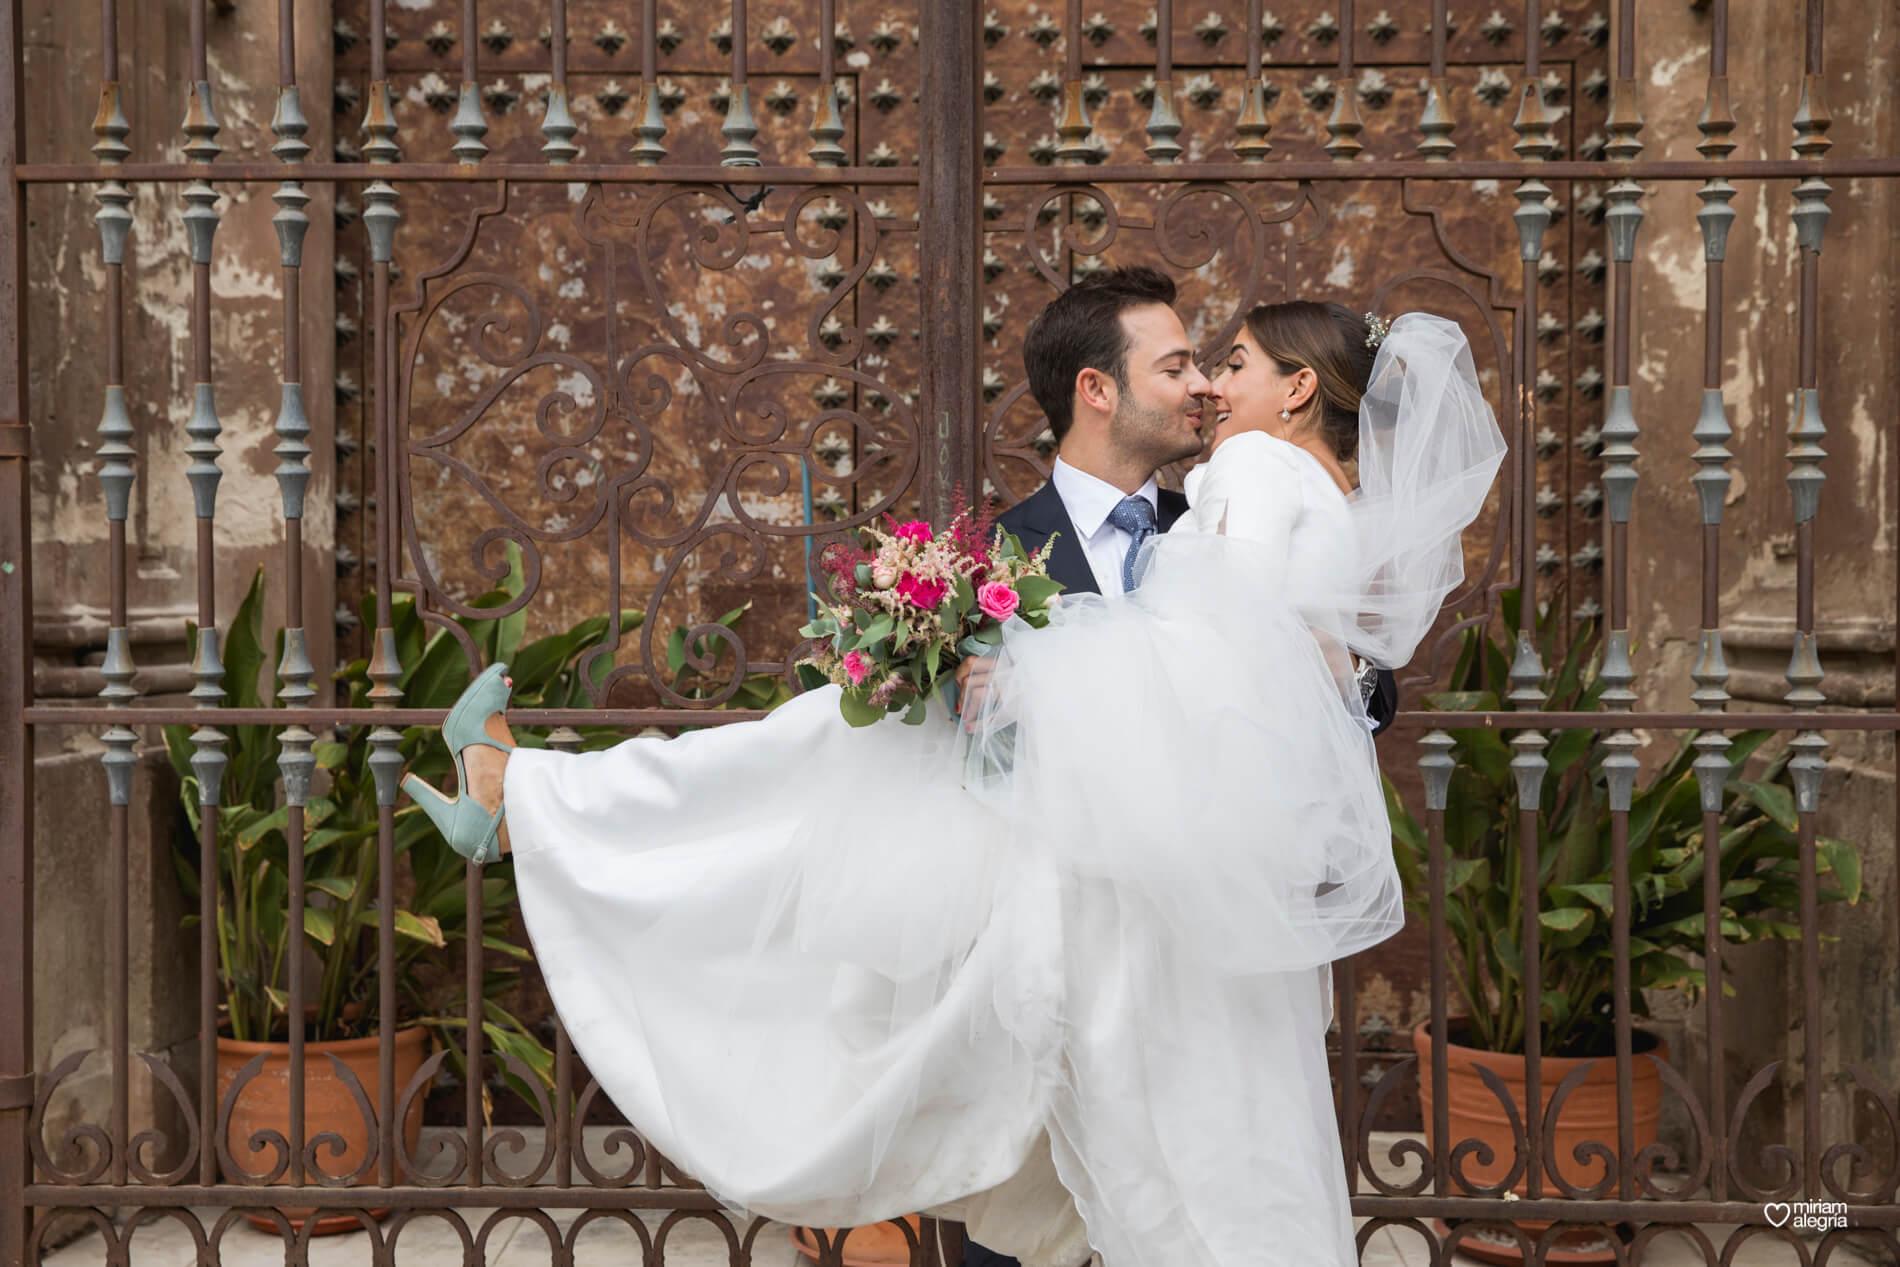 vestido-de-novia-paula-del-vas-miriam-alegria-fotografos-boda-murcia-80